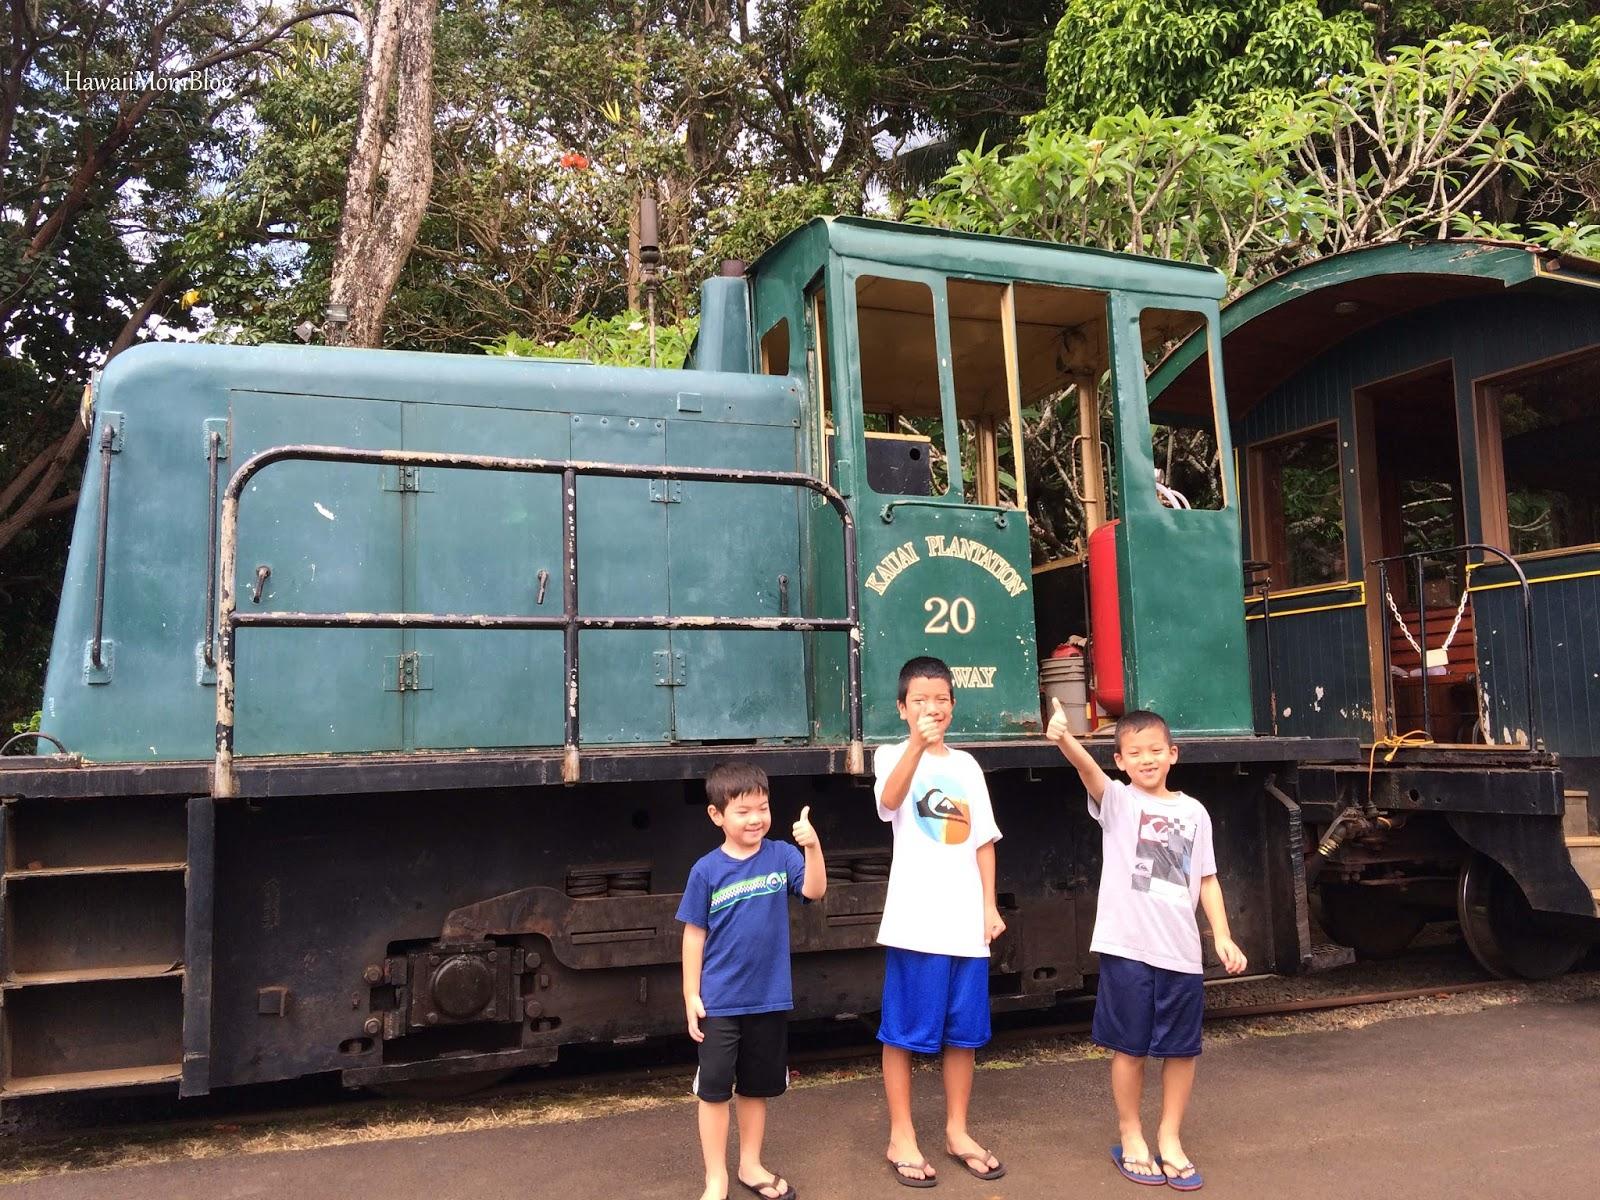 Kilohana Signature Train Tour